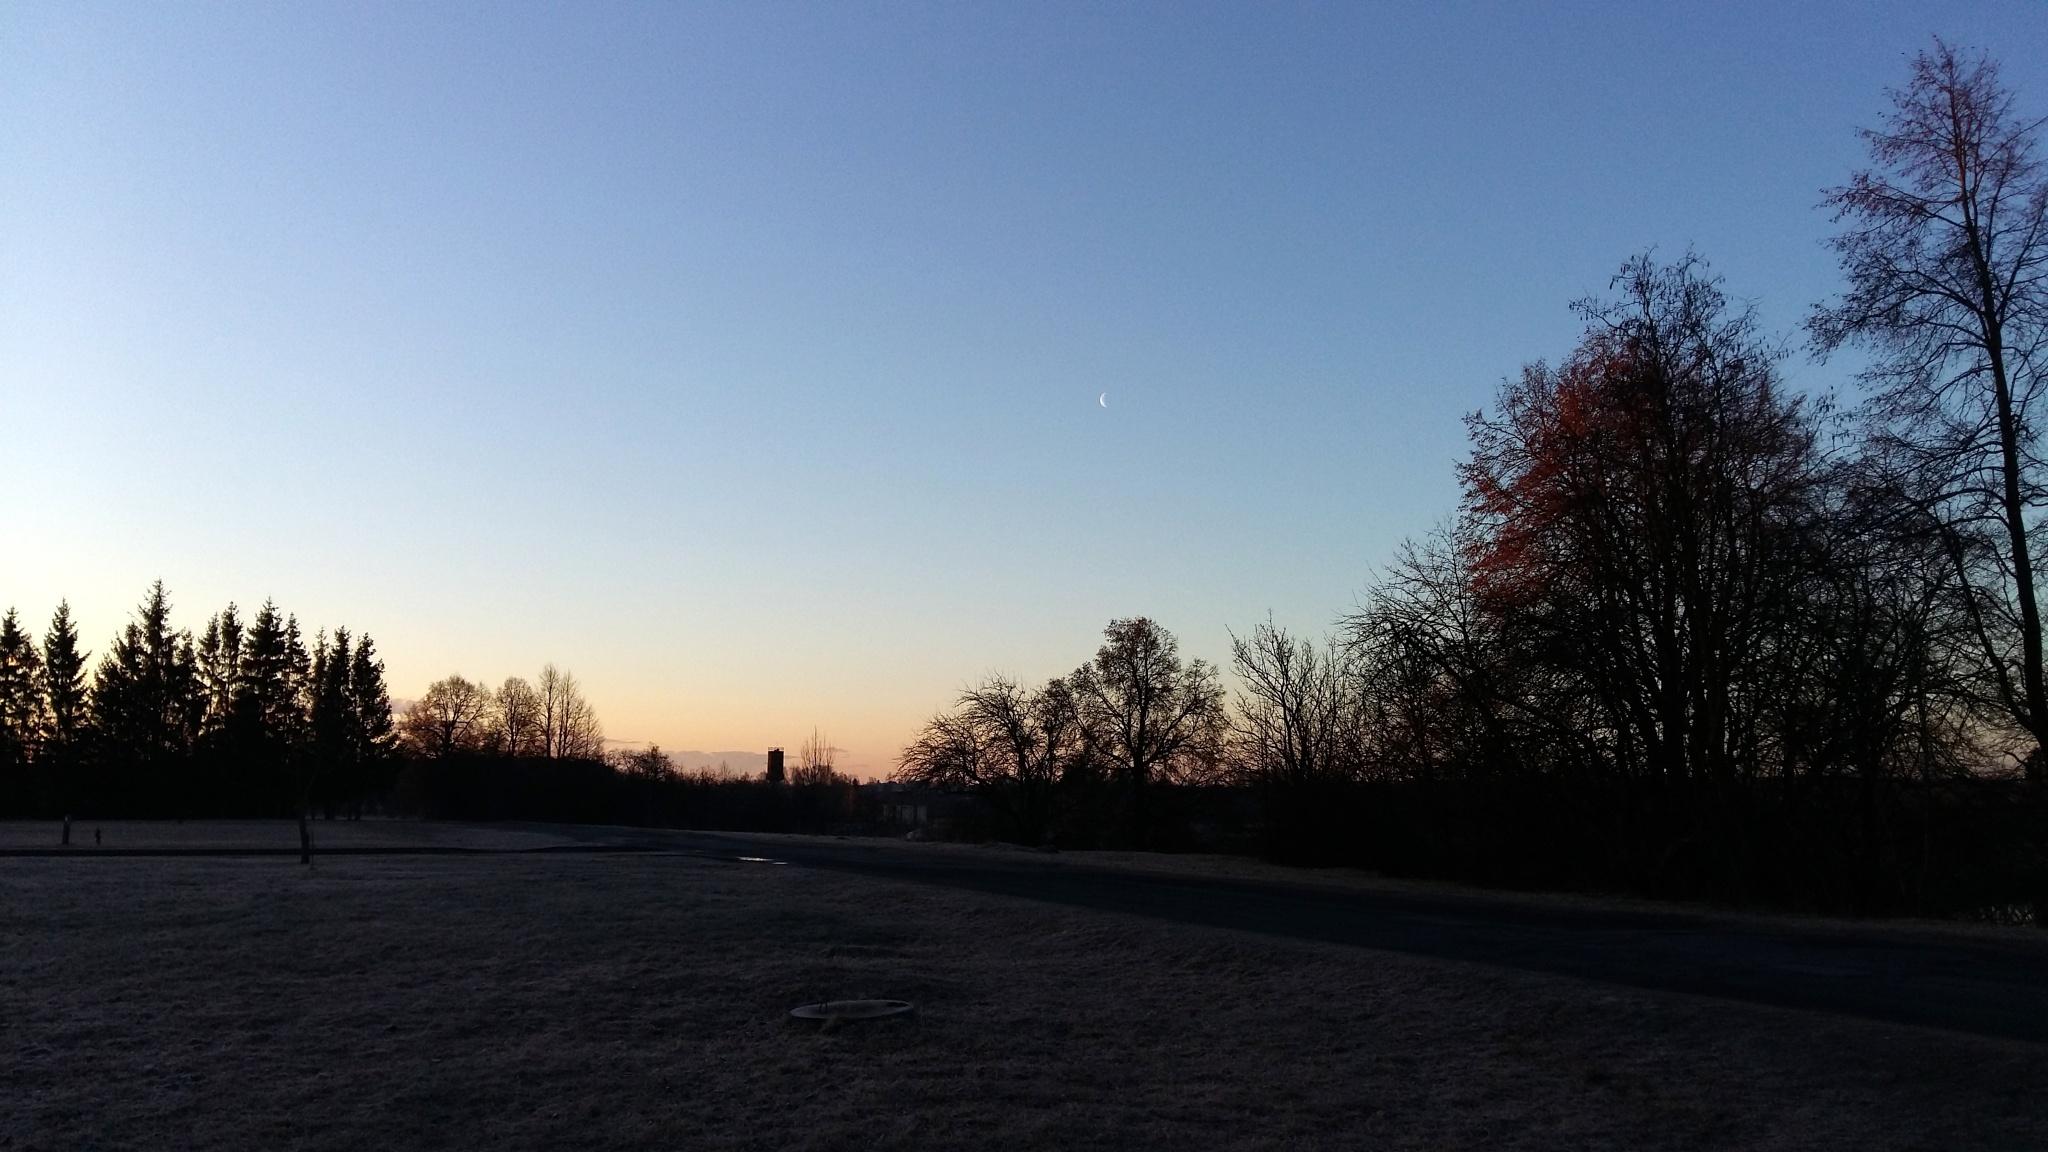 Morning sky. by uzkuraitiene62